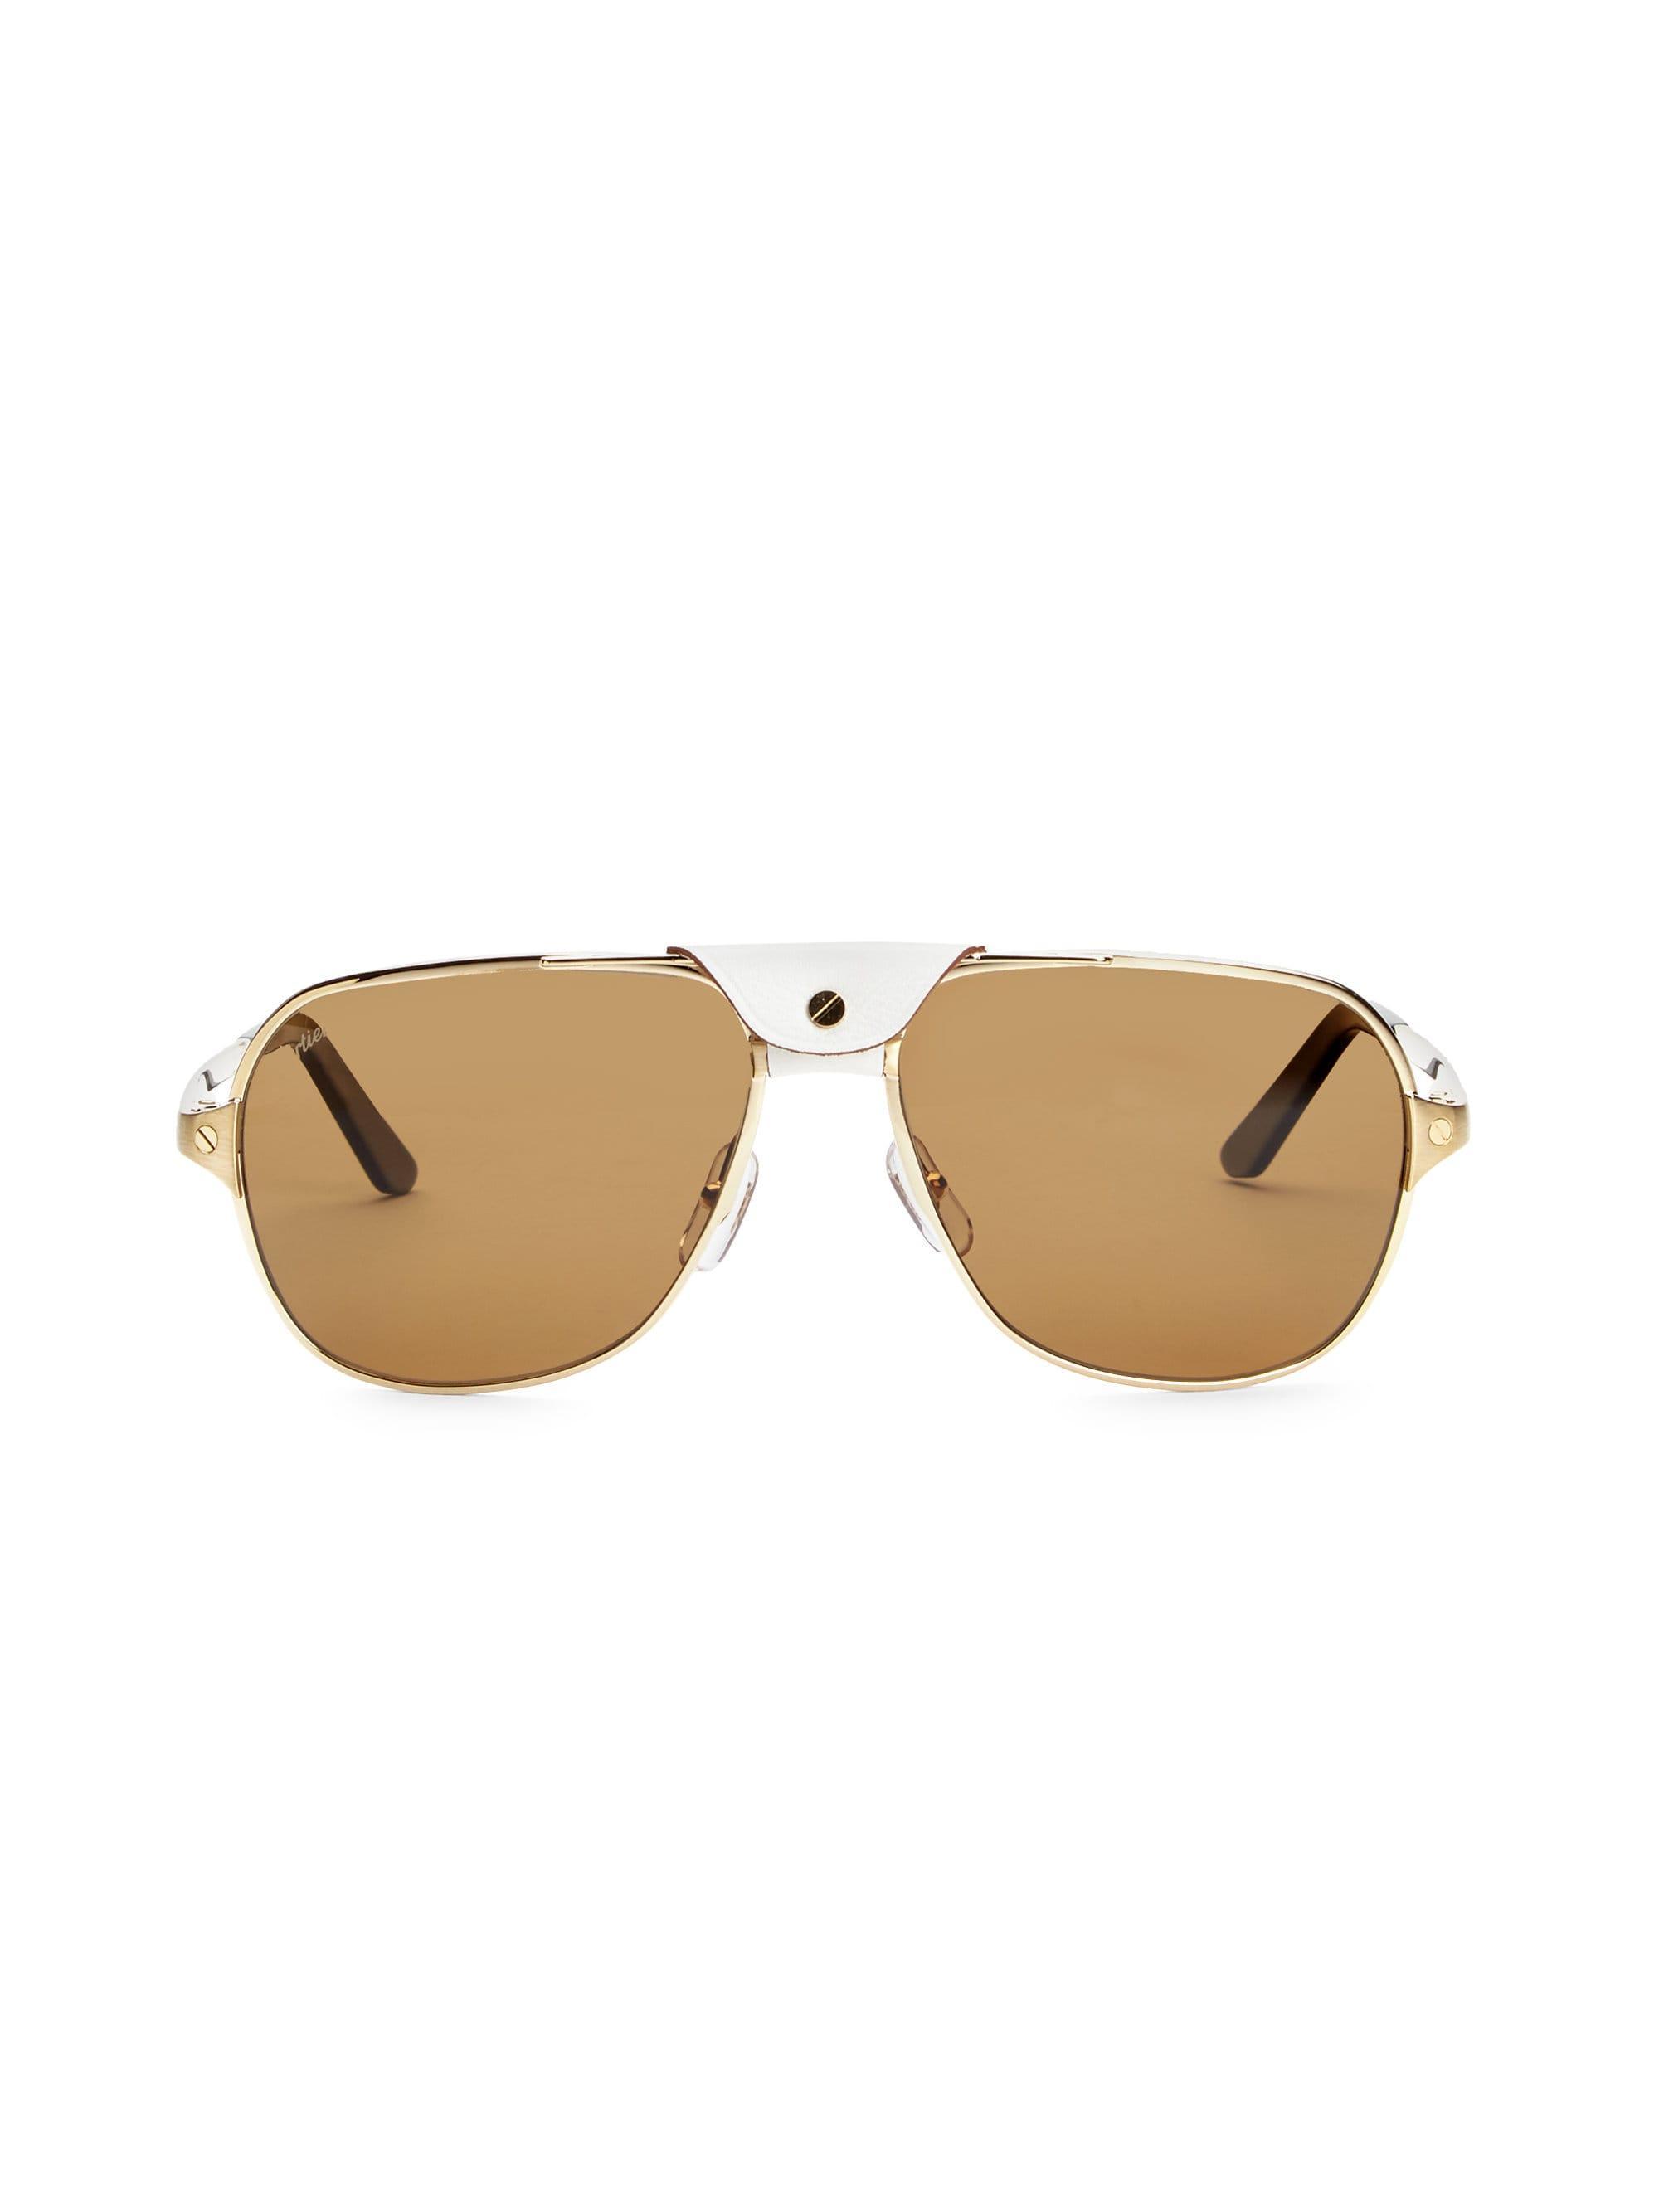 805ac012ef1cc Lyst - Cartier Women s 60mm Aviator Sunglasses - Gold in Metallic